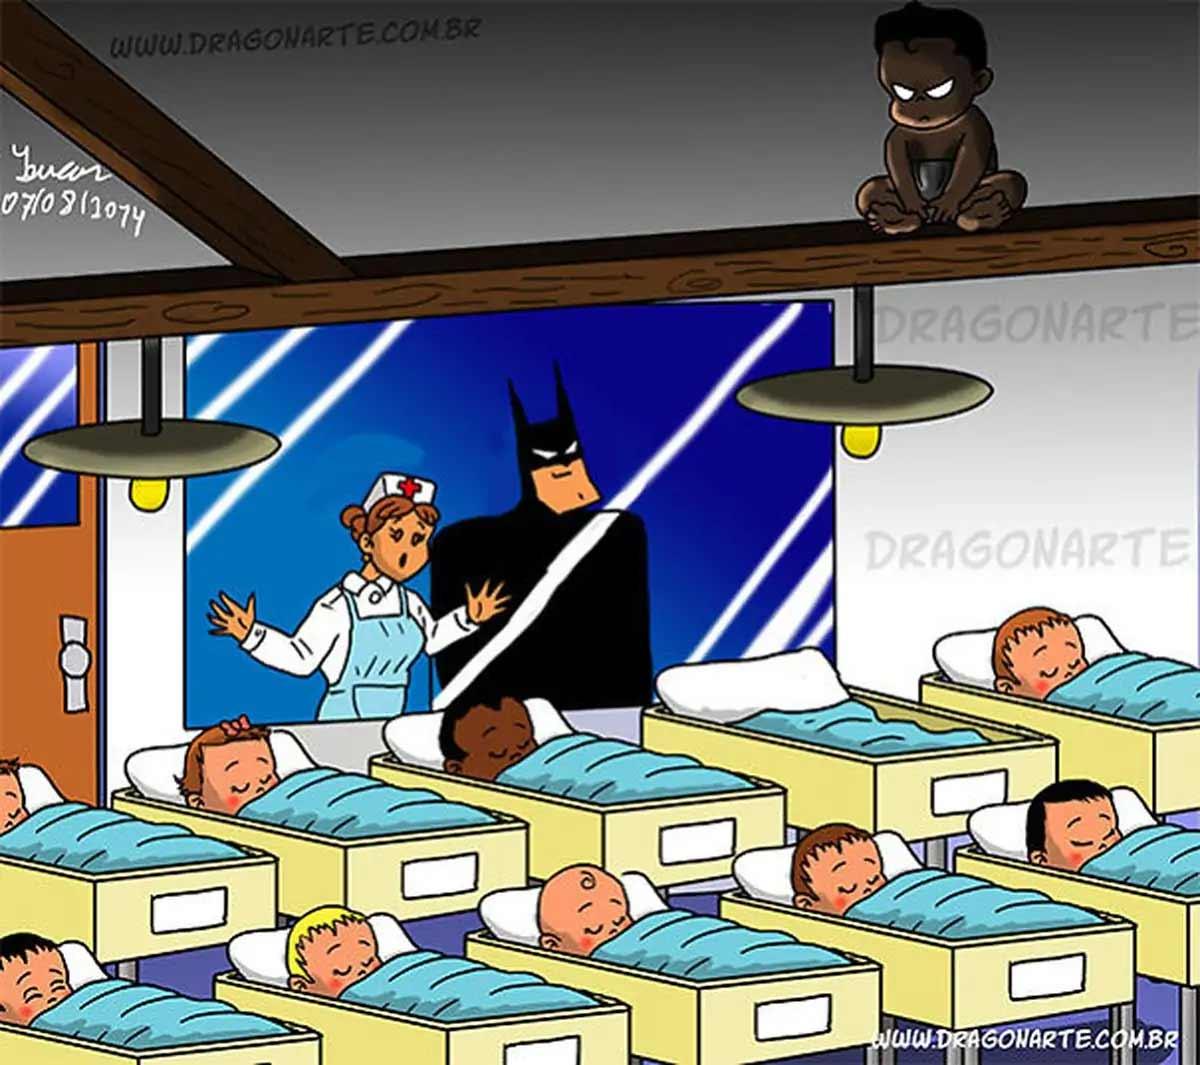 Wenn Superhelden Babies hätten Dragonarte-superheroe-babies_02